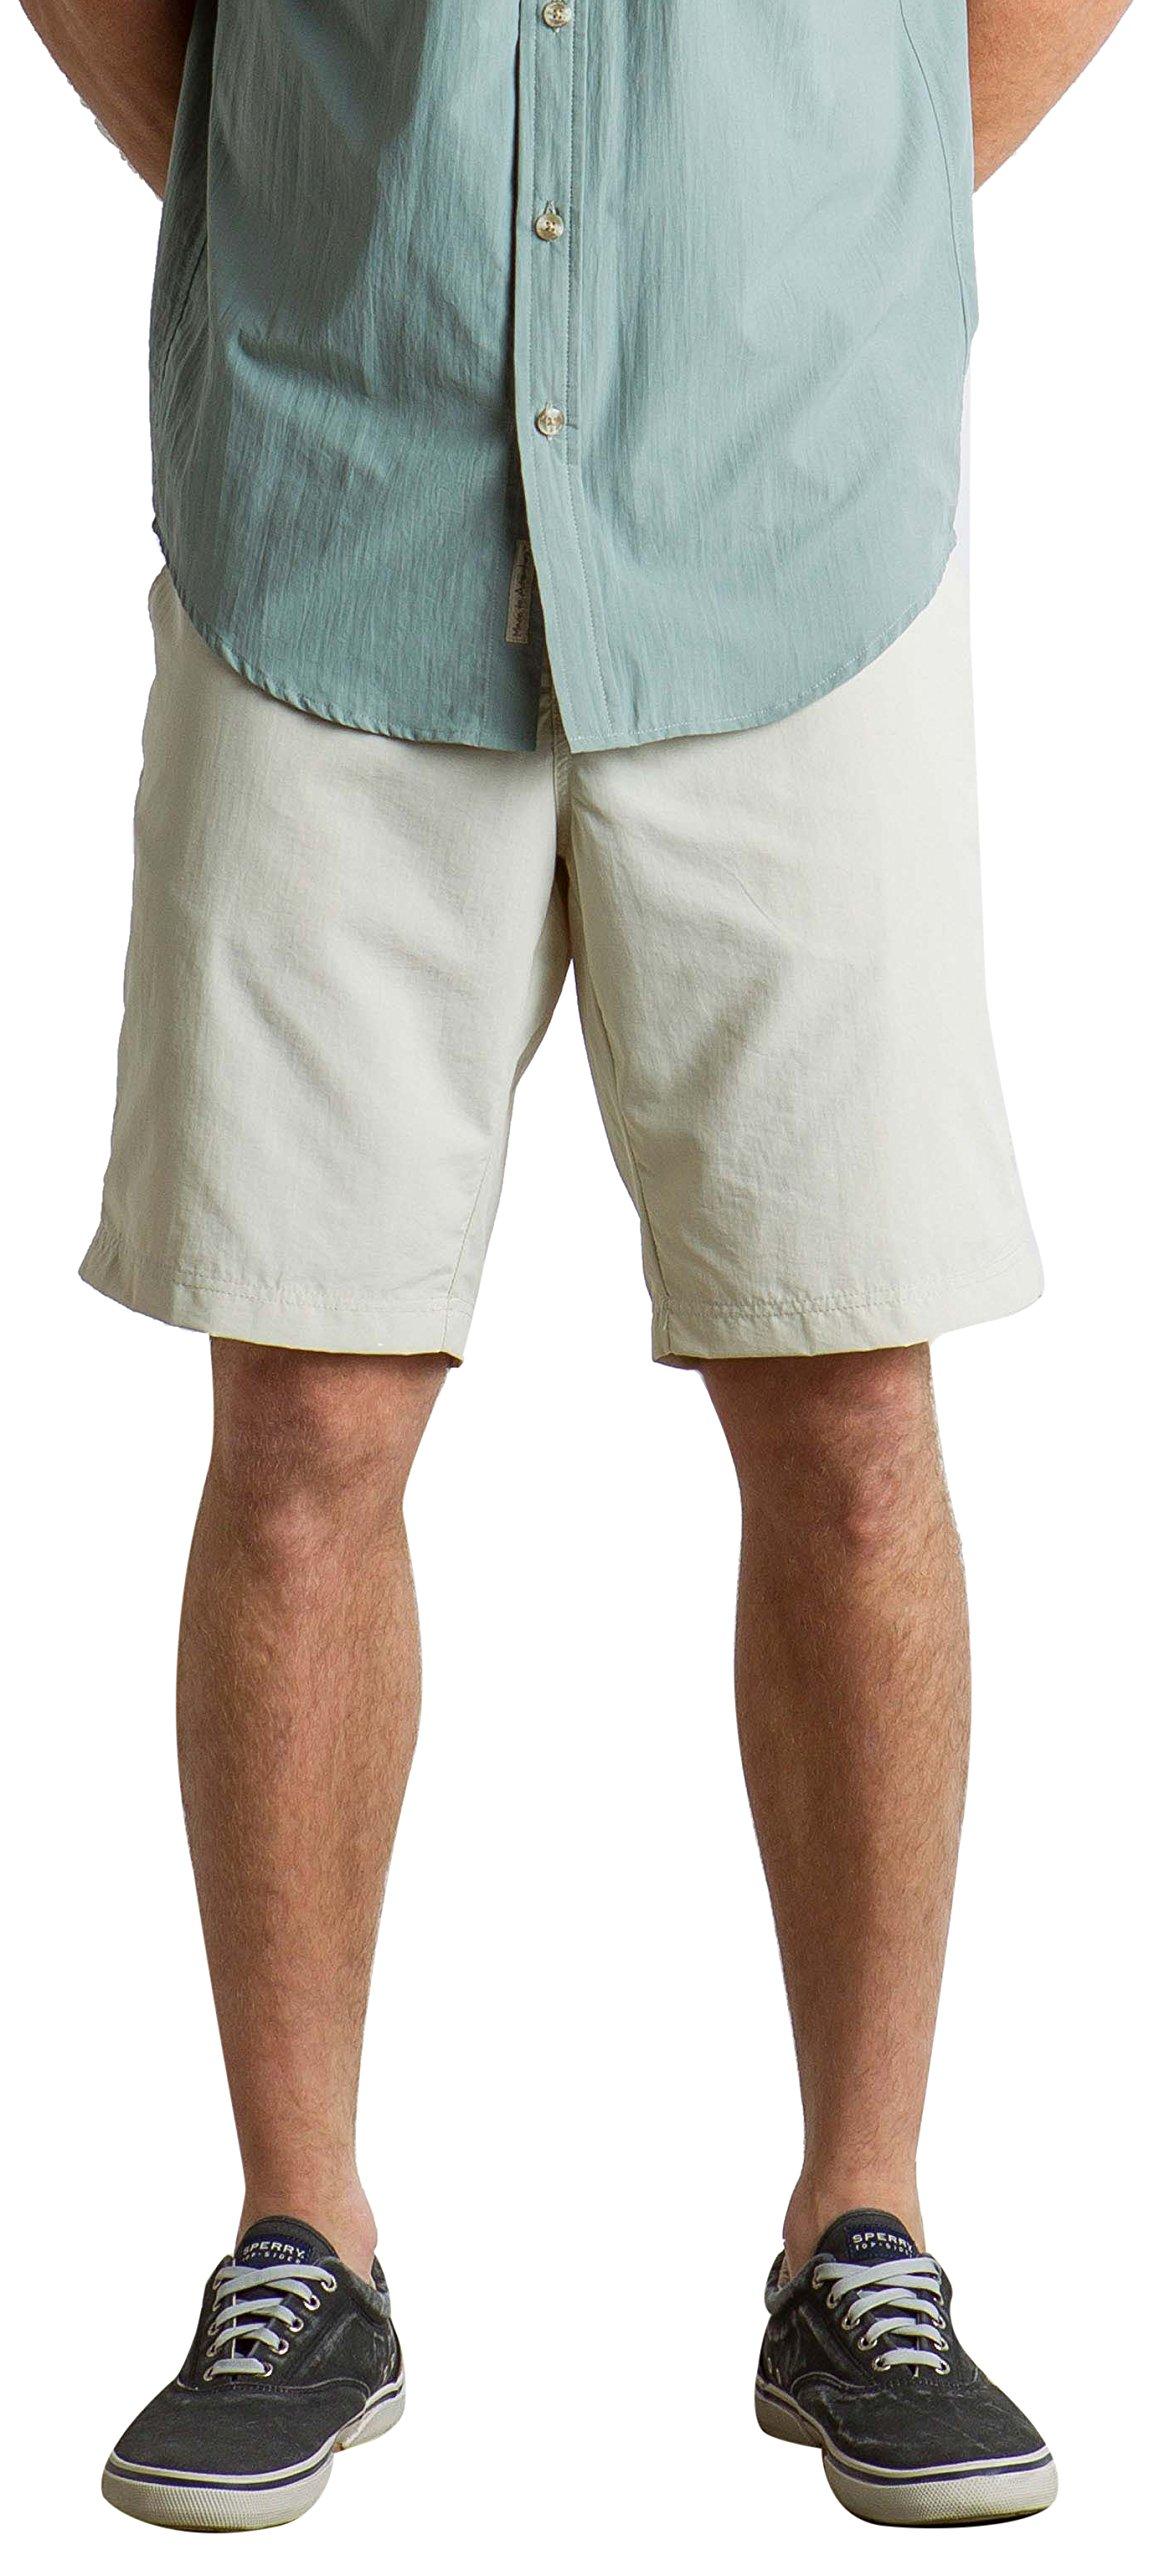 ExOfficio Men's Sol Cool Nomad Lightweight Quick-Dry Shorts, 10'', Light Stone, Size 34 by ExOfficio